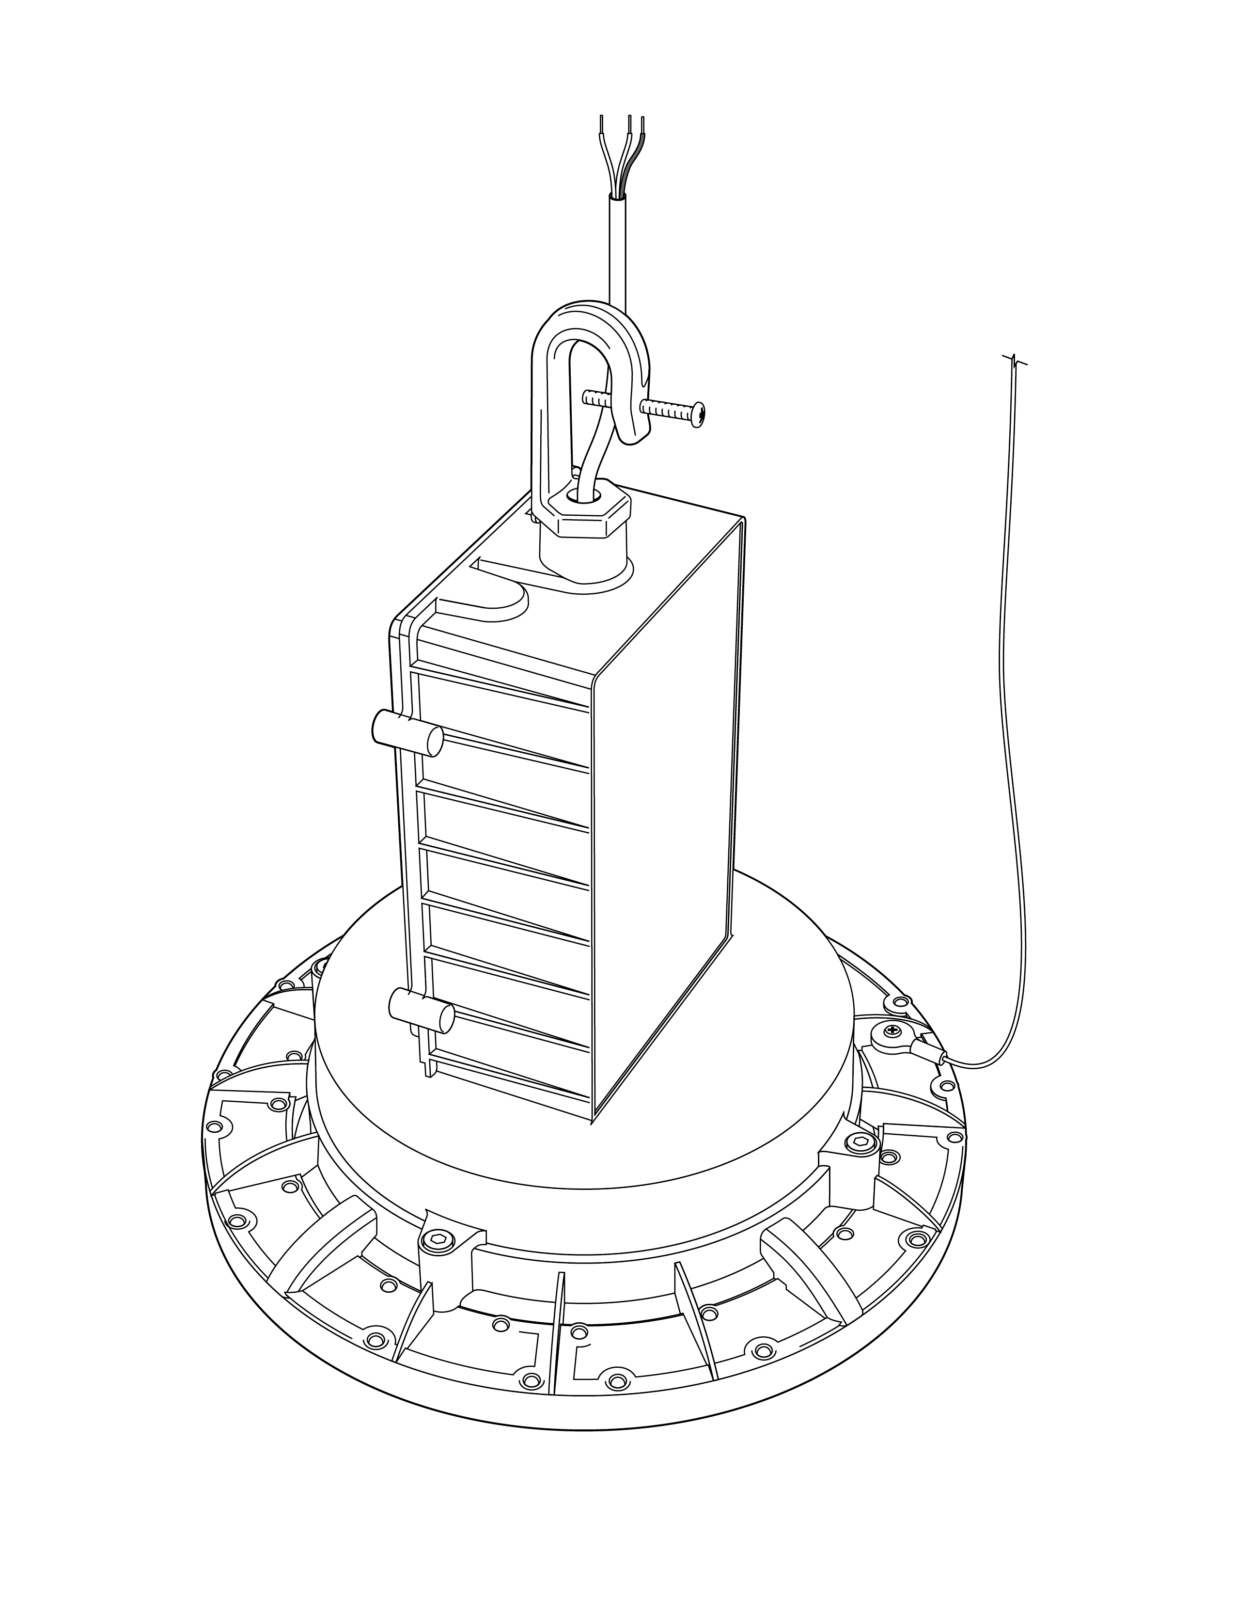 LED Emergency Light Suspension Mounting